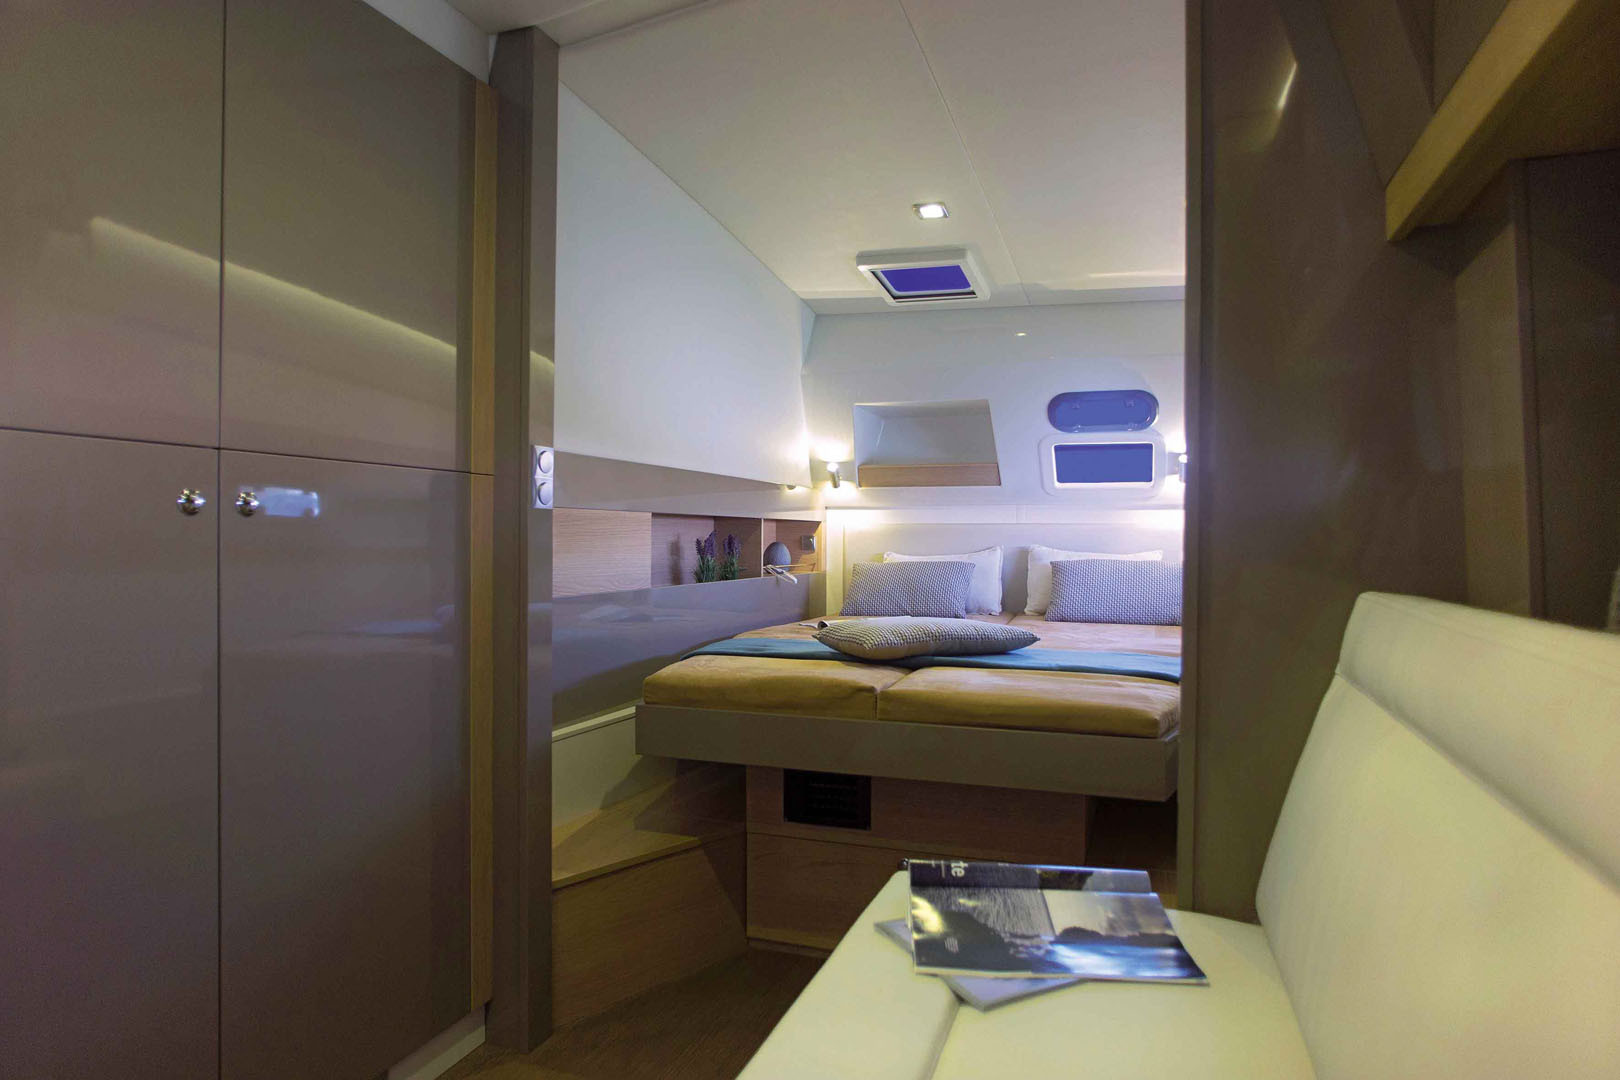 BALI-4.5-interior-master-cabin-Biba-Tour-rent-boat.jpg